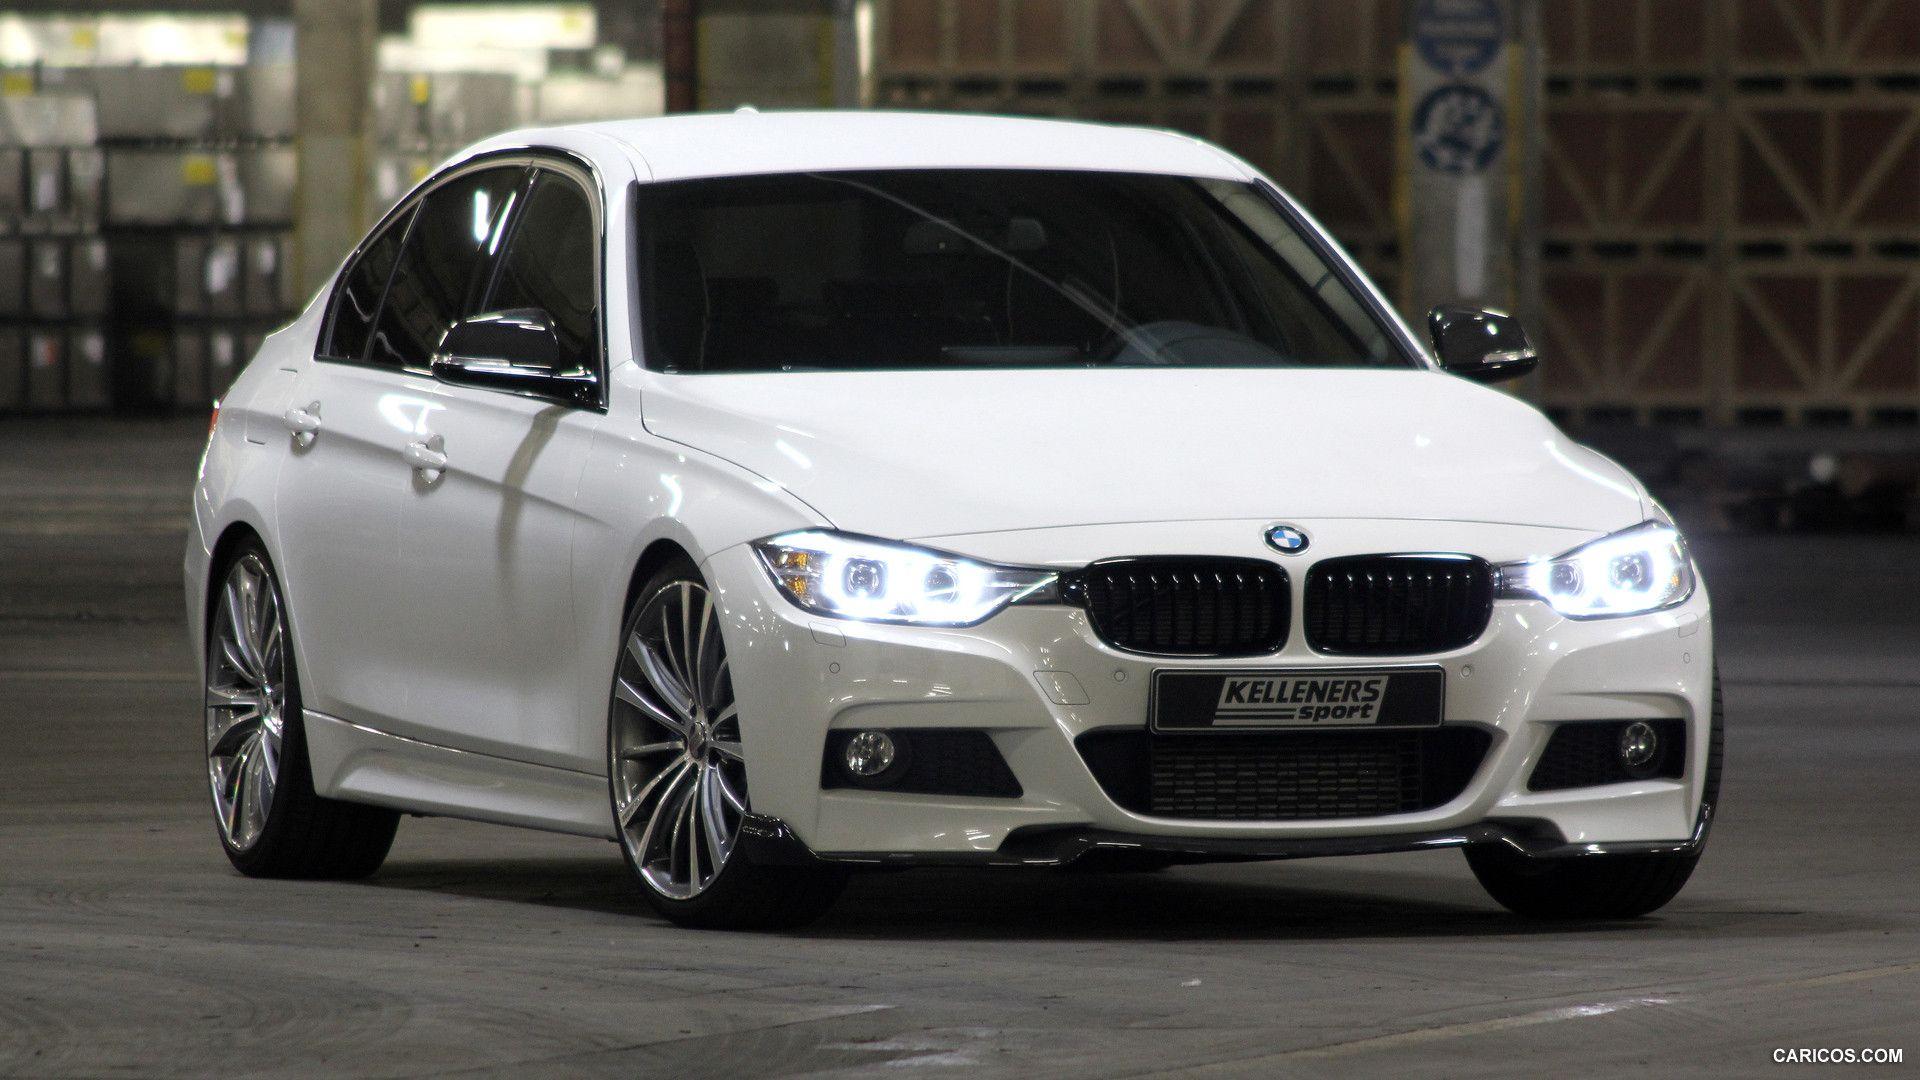 2014 Kelleners Sport BMW 3Series M Sport Package Auto